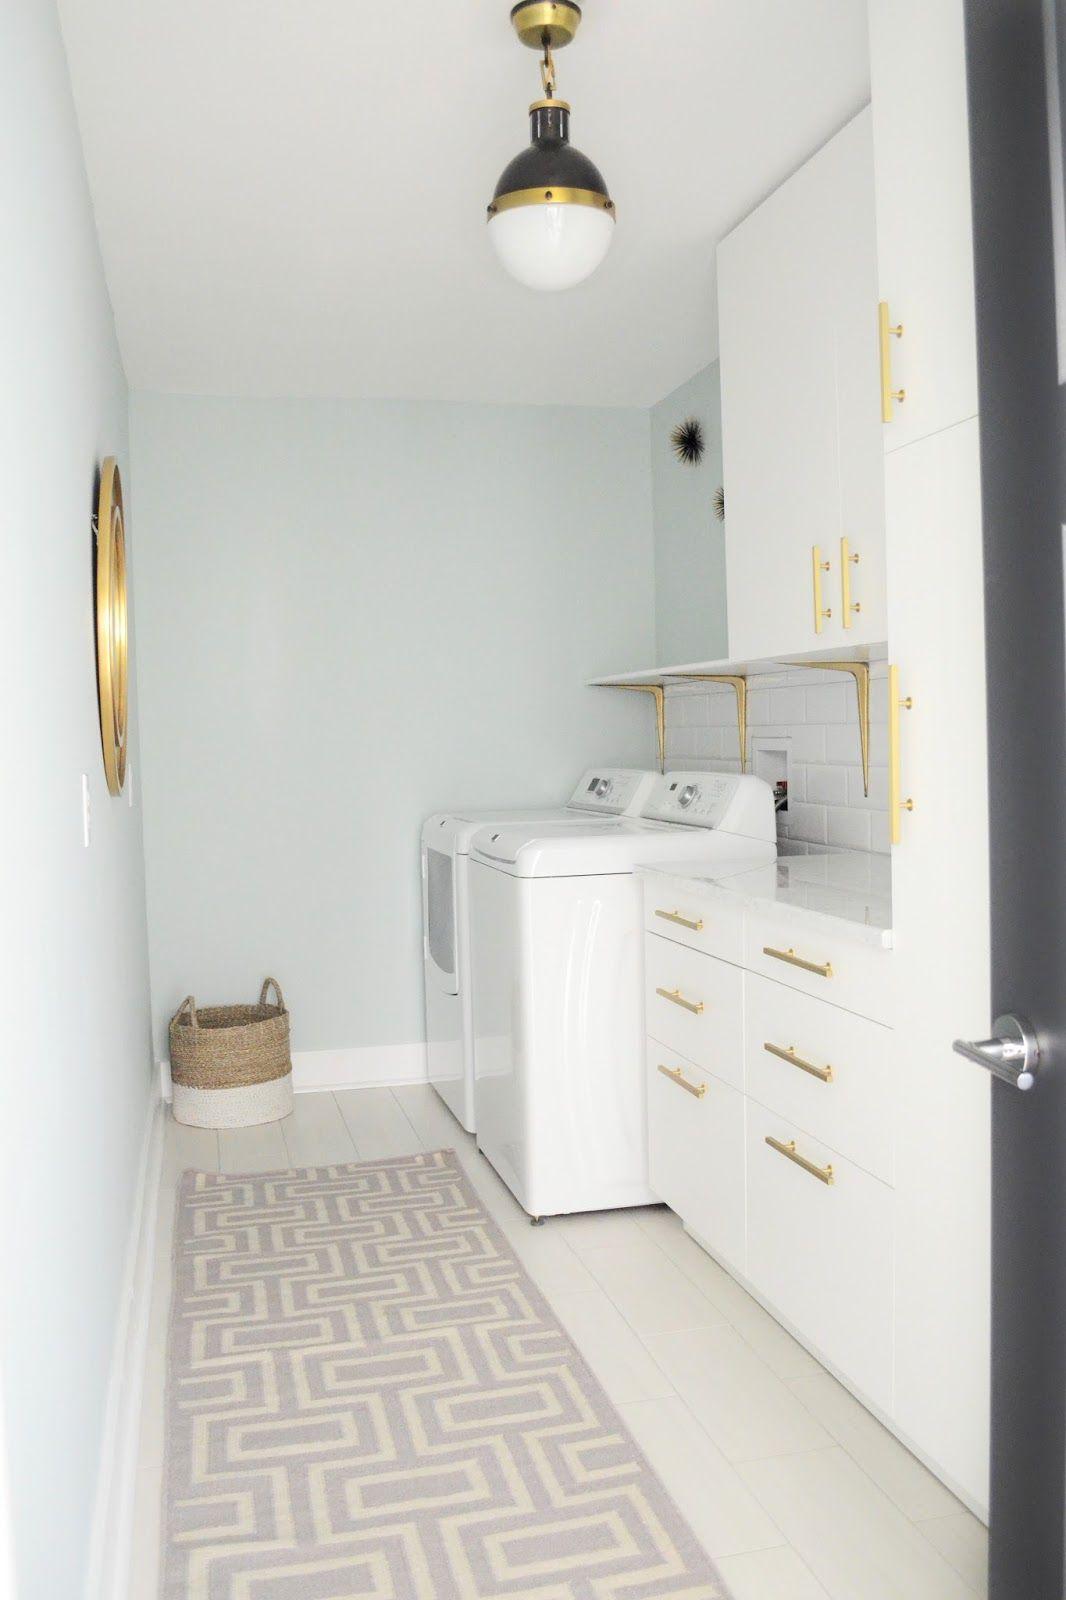 Laundry Room Hicks Pendant | Brushed Brass Cabinet Hardware